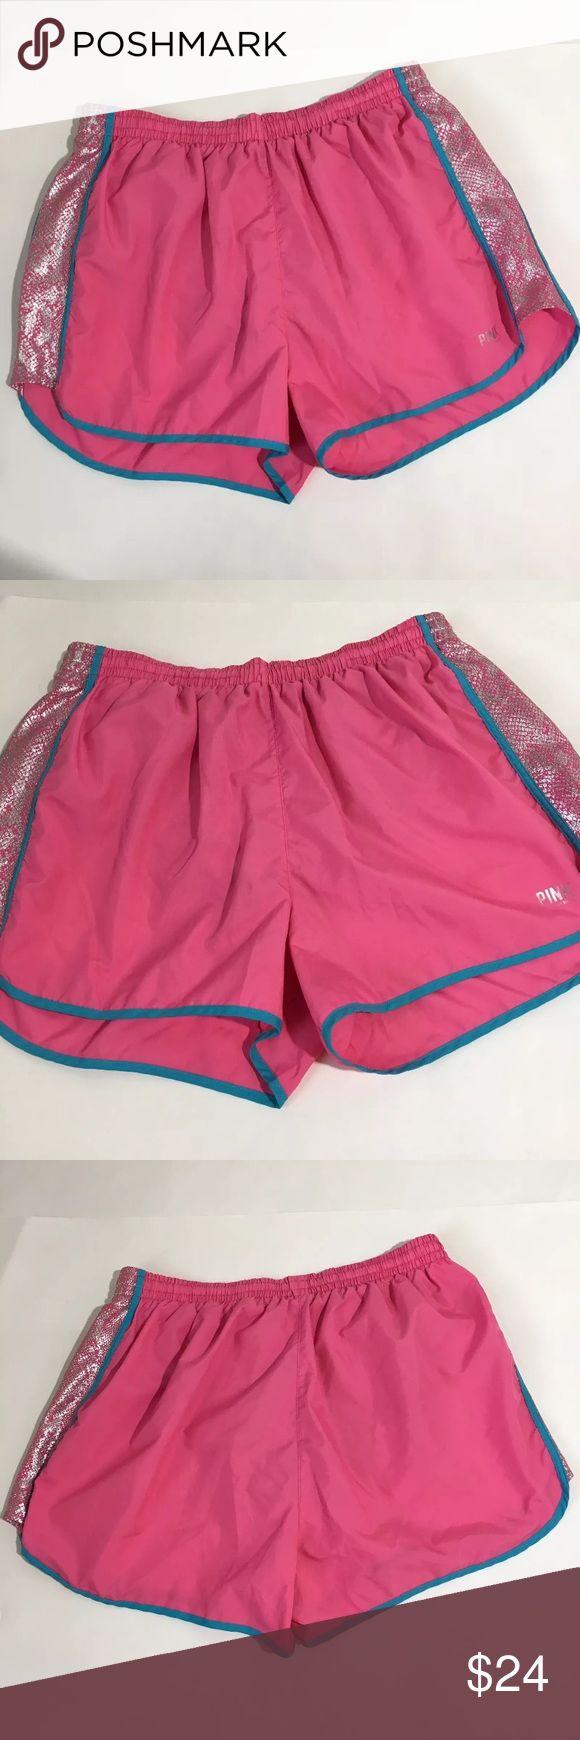 "VS PINK Workout Athletic Shorts Builtin Liner Lrg Women's PINK workout athletic shorts with builtin lining underwear. Size L. 14.5"" waist, 13"" waist to hem. Excellent condition no flaws PINK Victoria's Secret Shorts"